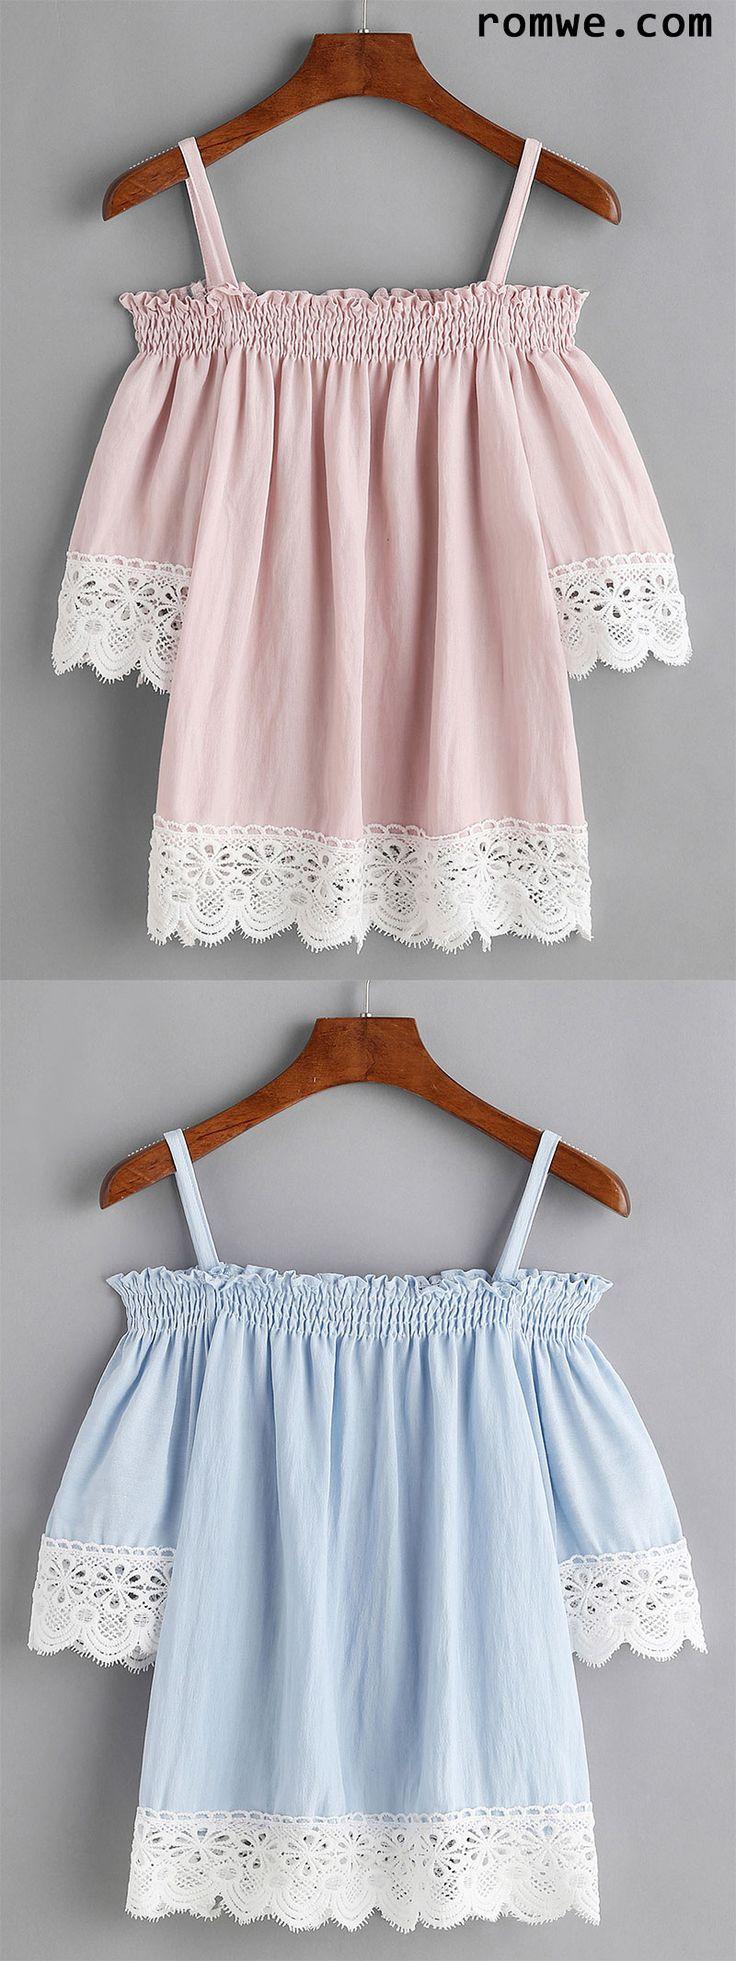 Contrast Lace Trim Cold Shoulder Shirred Blouse